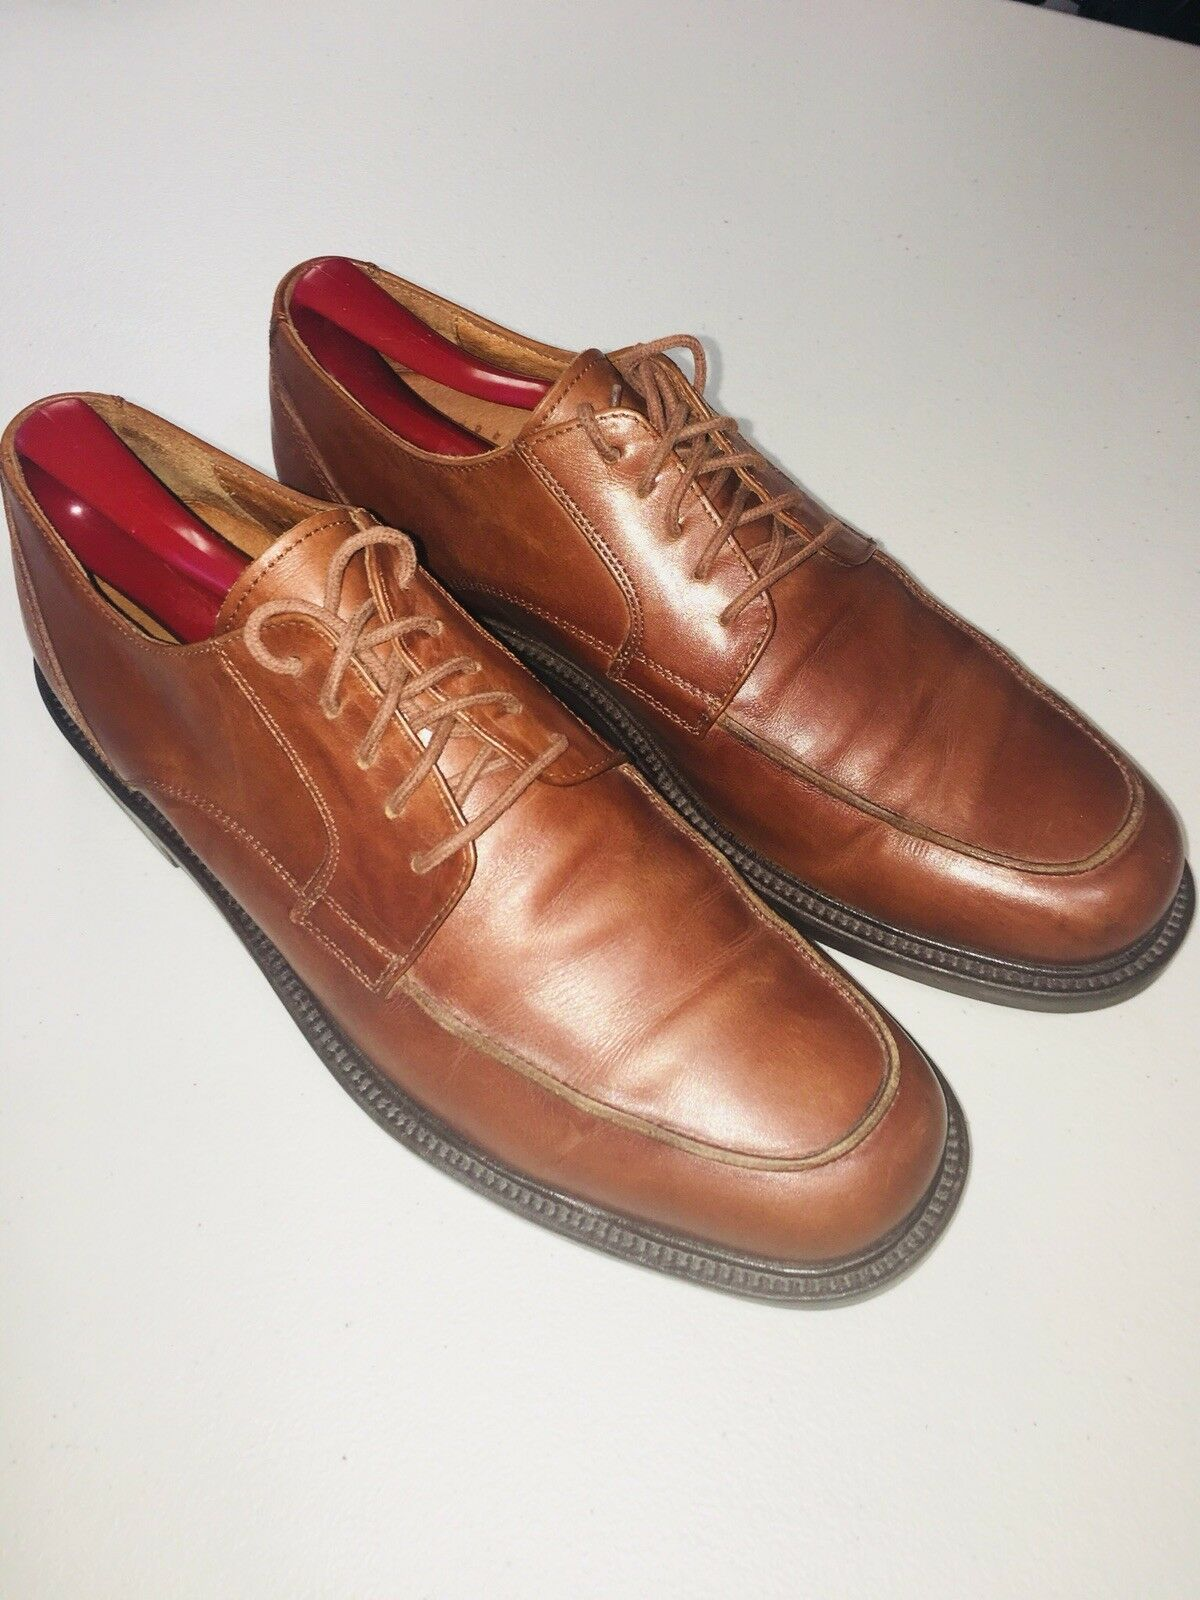 Johnston and Murphy 20-1510 Dress Brown Shoes Mens 8.5 Passport Brown Dress moc toe Italy ba5960